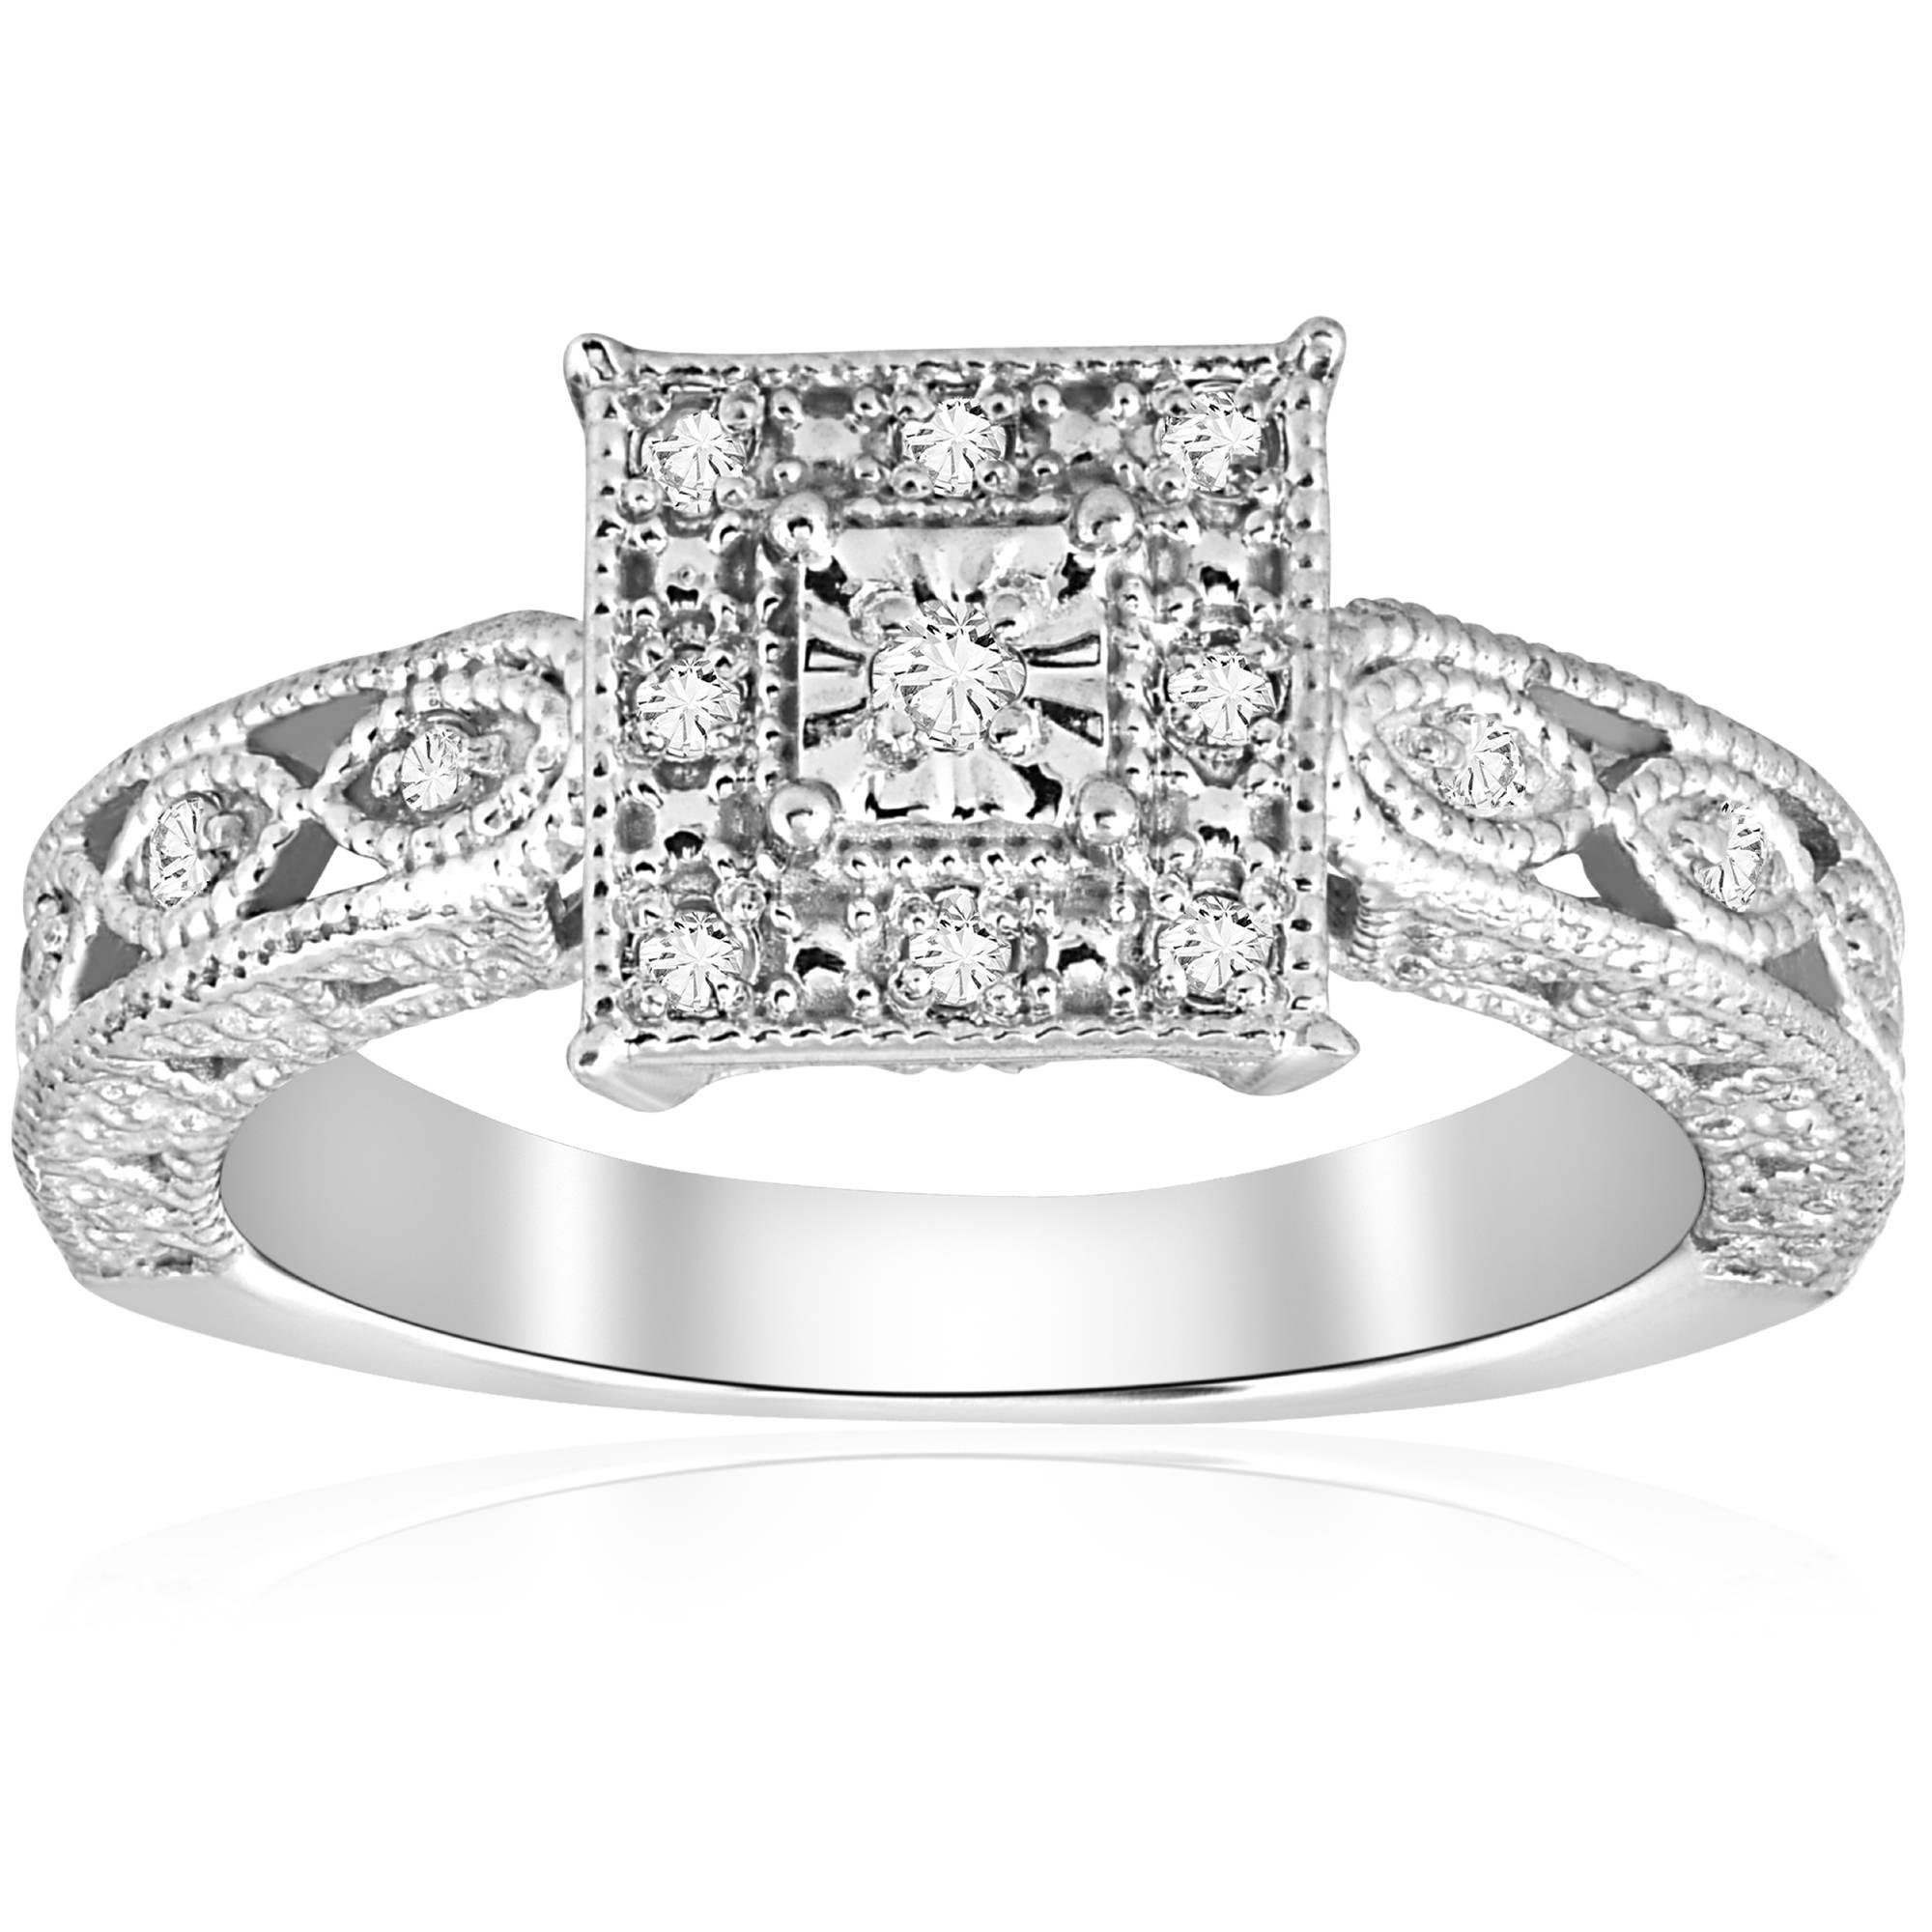 1 10ct vintage diamond ring silver engagement anniversary. Black Bedroom Furniture Sets. Home Design Ideas